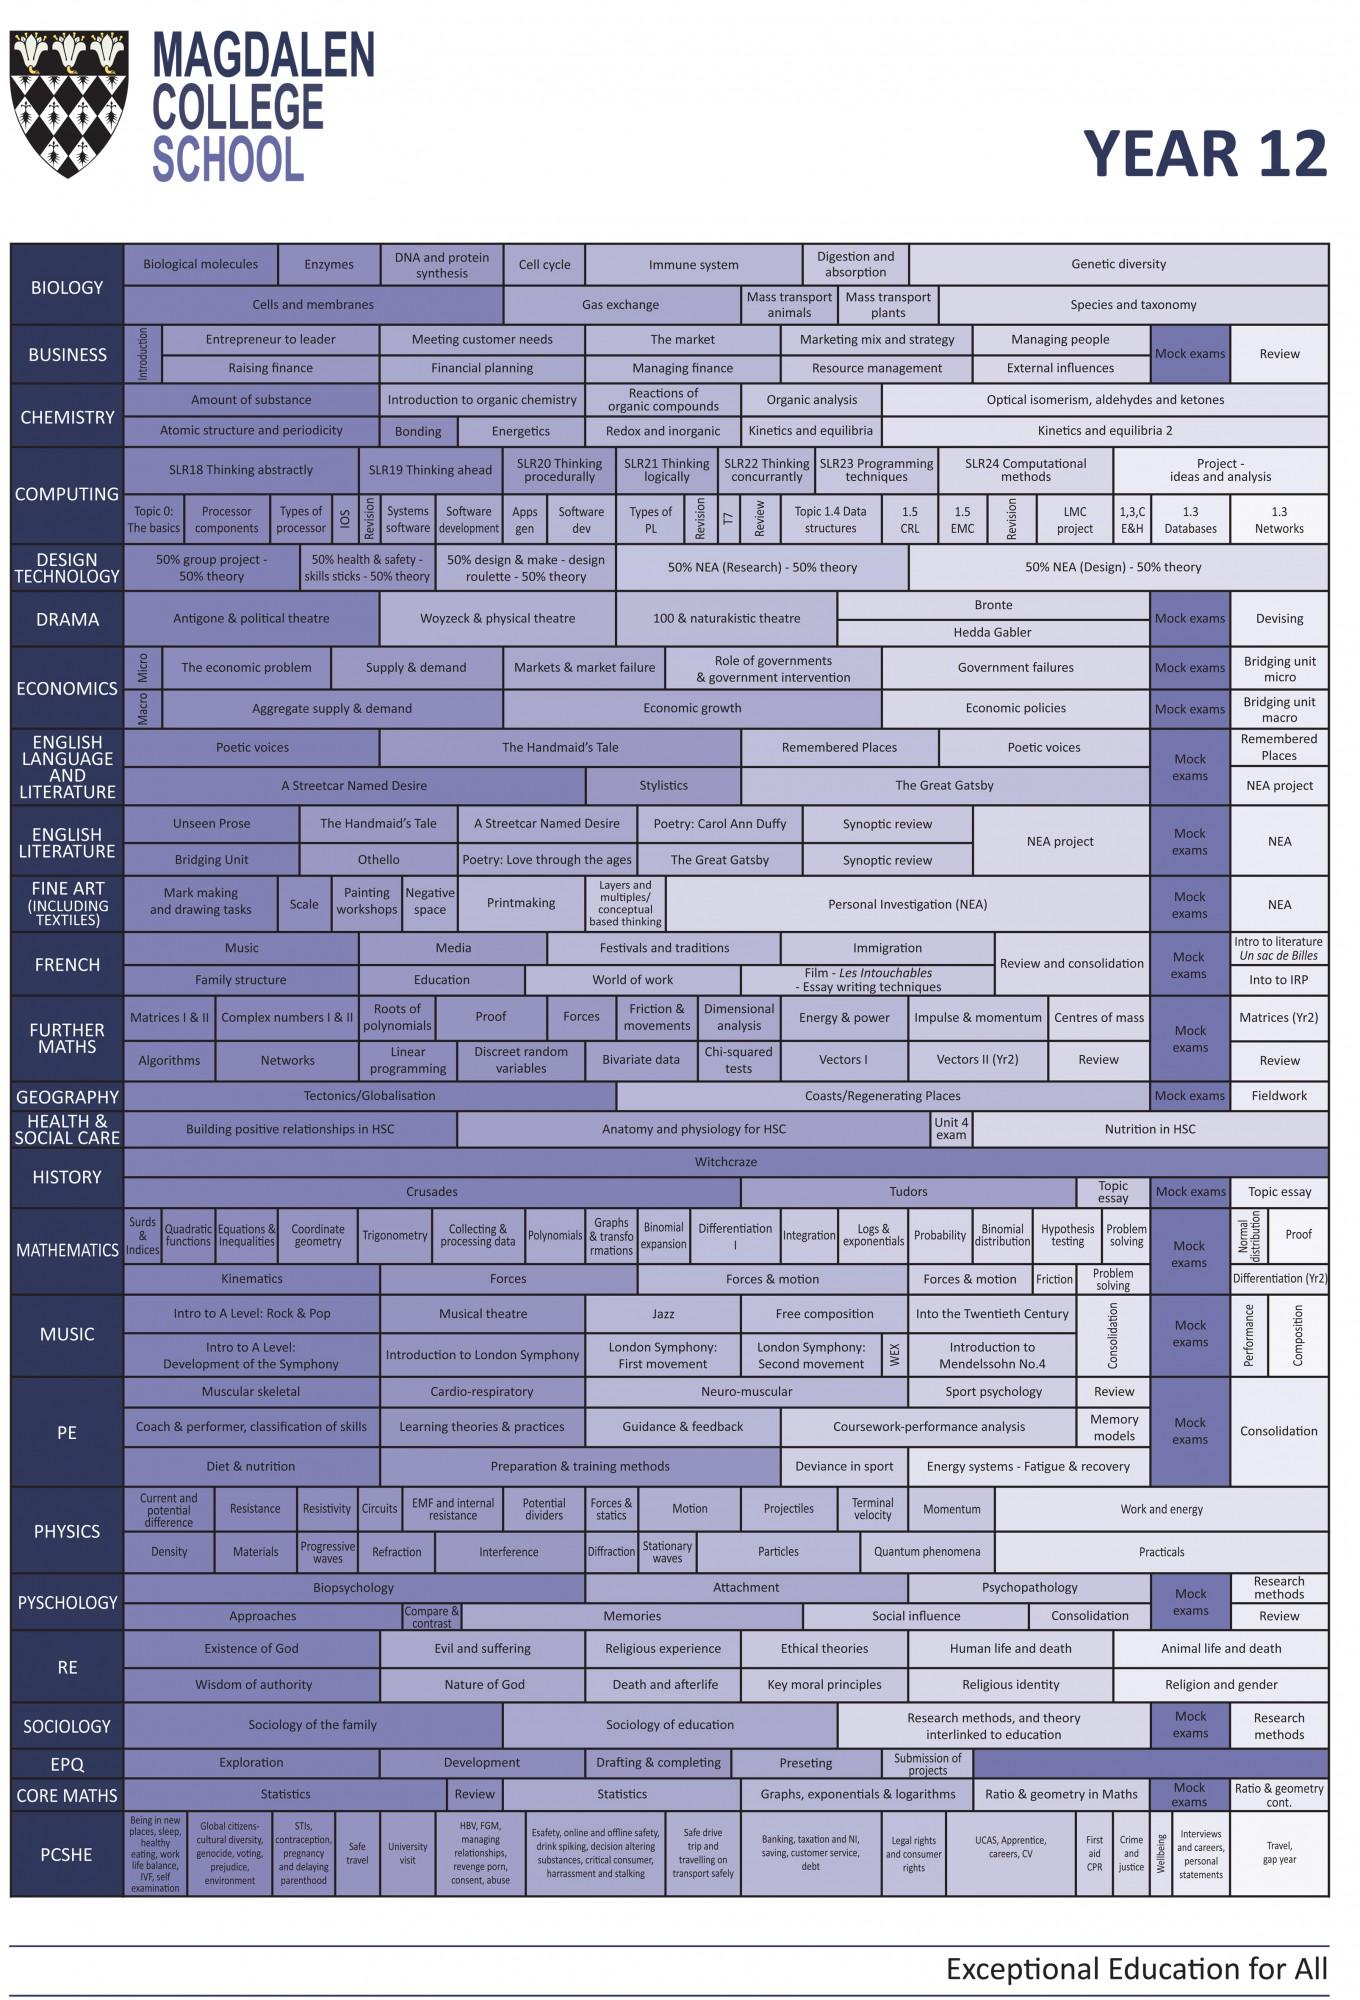 Year 12 curriculum